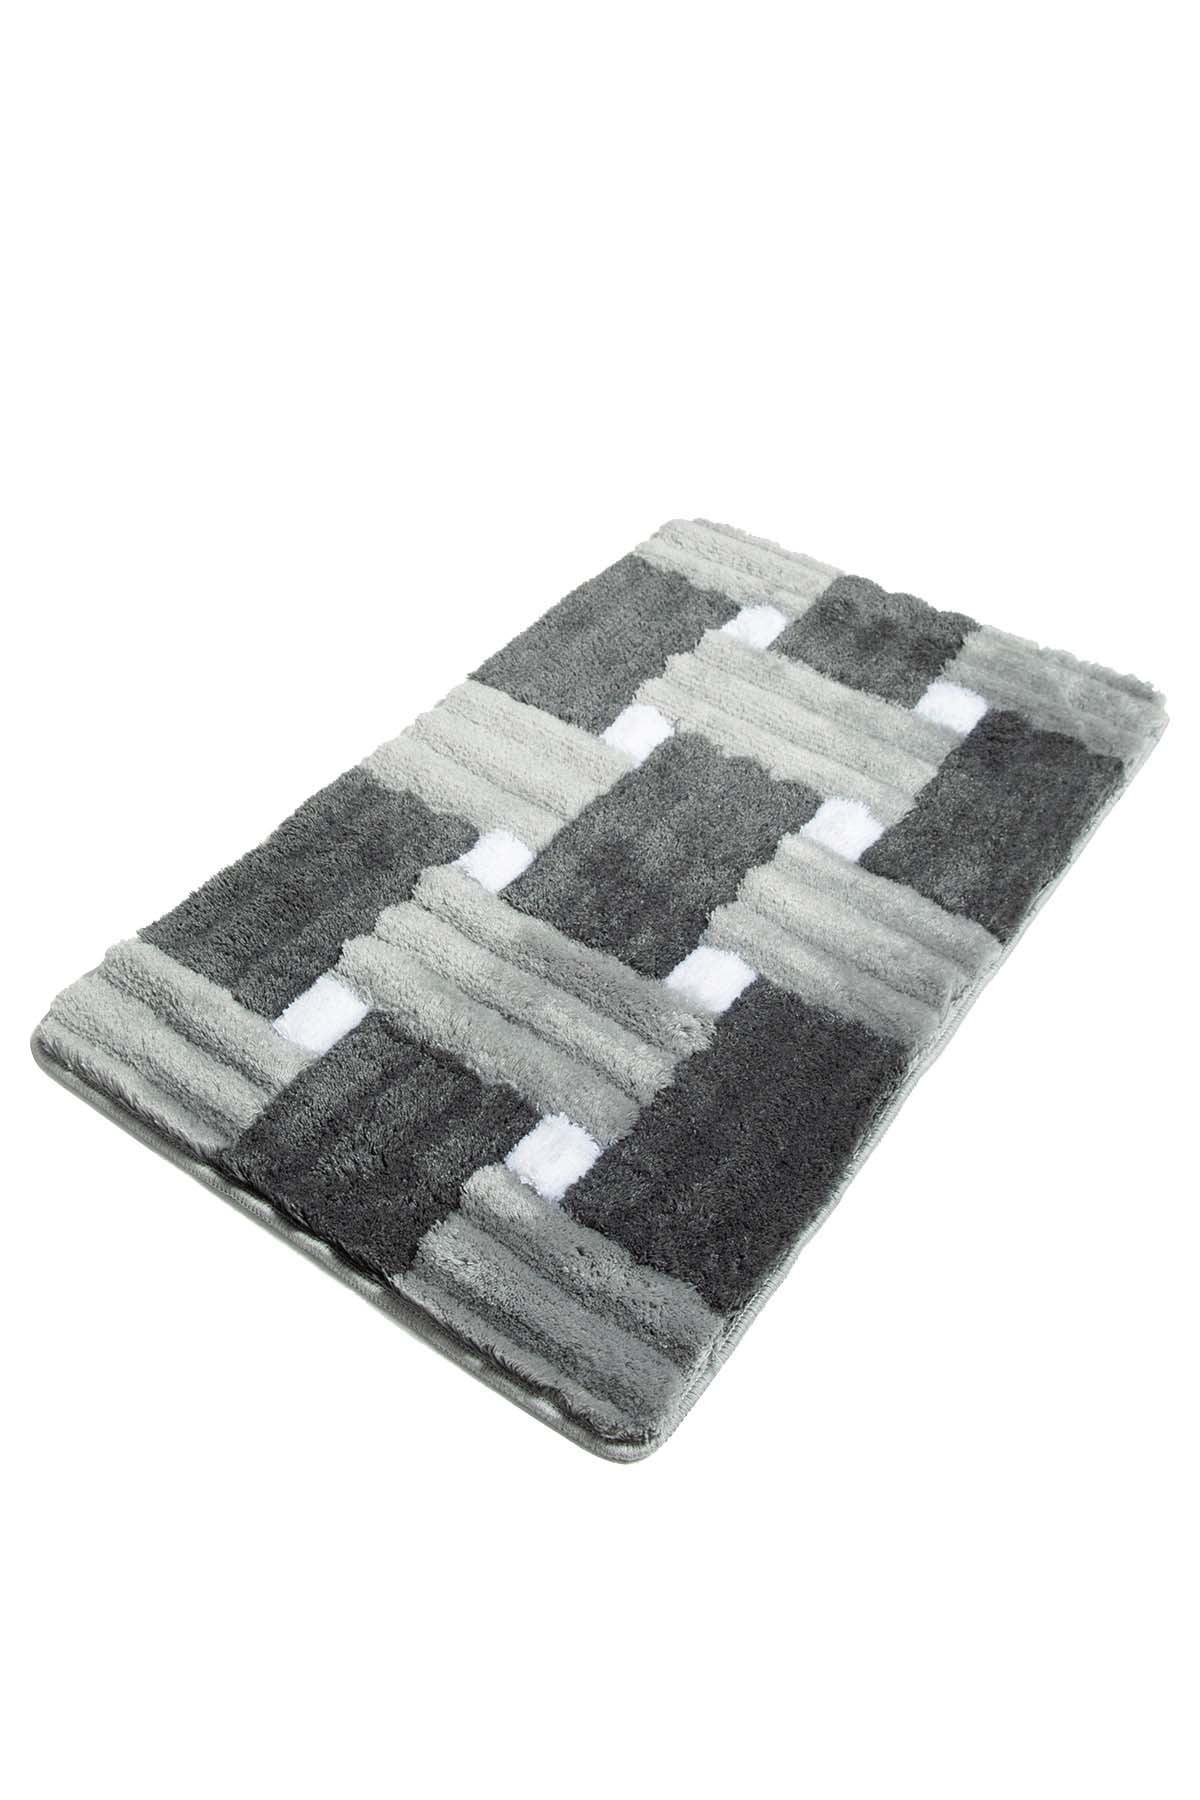 Picture of: Antibacterial Rectangle Non Slip Bath Rug Gray Black White Colors Walmart Com Walmart Com